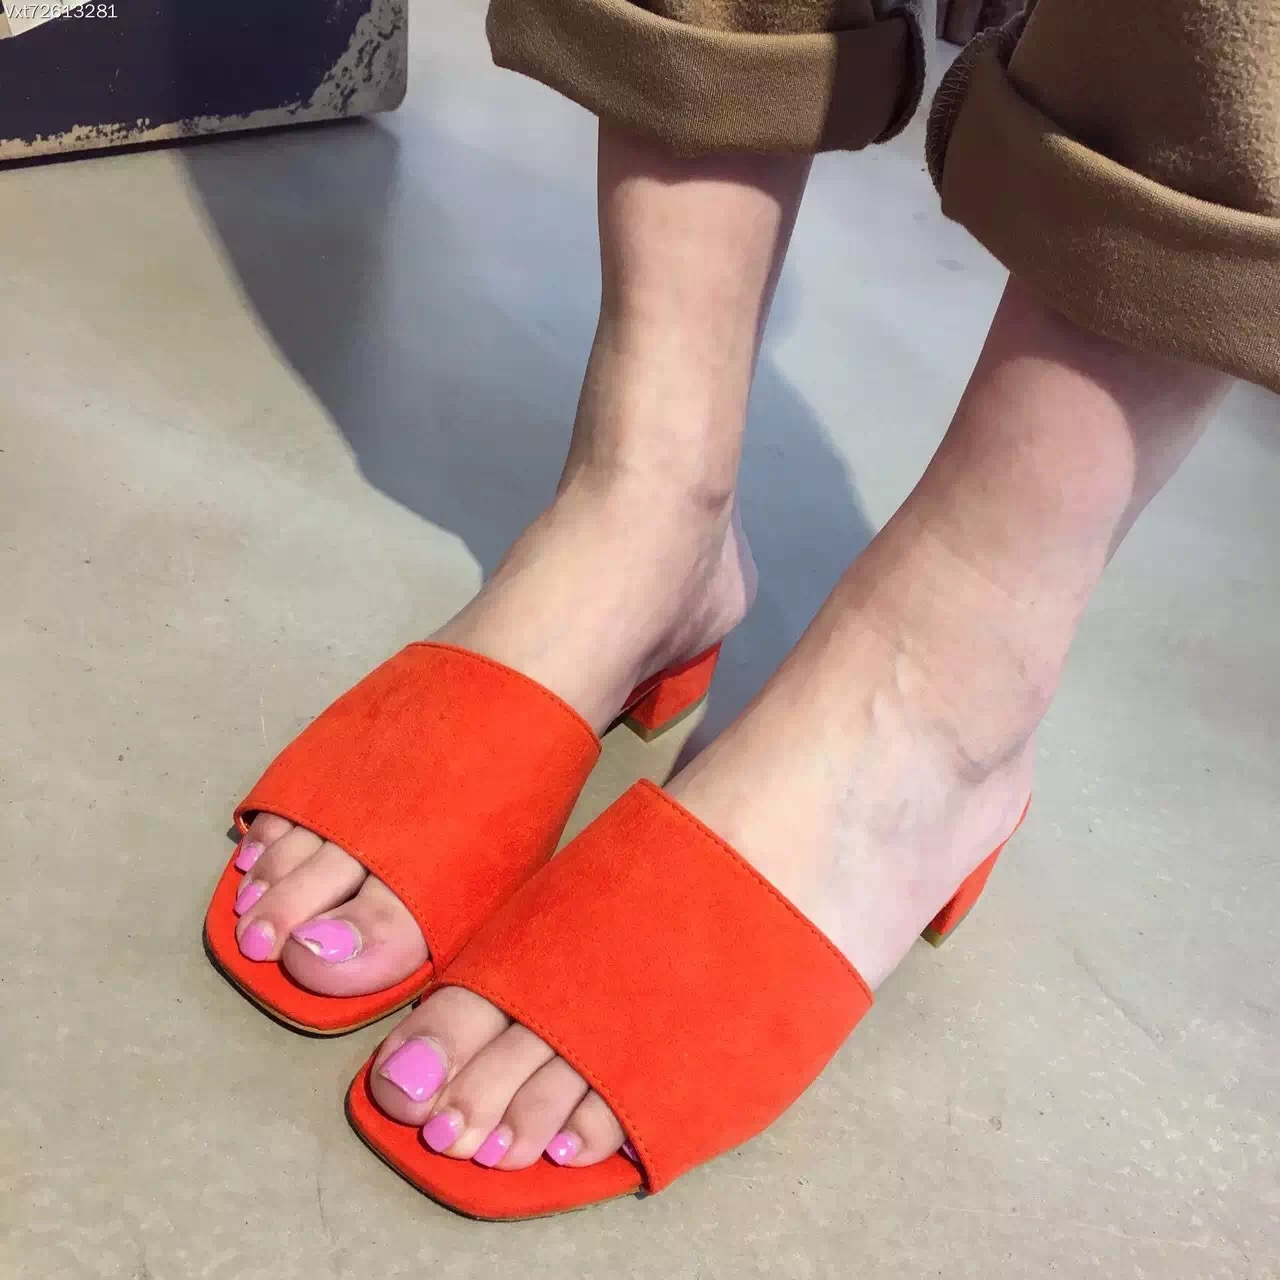 2016 Women's Fashion Suede Summer Slipper Orange Shoes Square Low Heel Sandalias Pompones Mules Cuir Femme